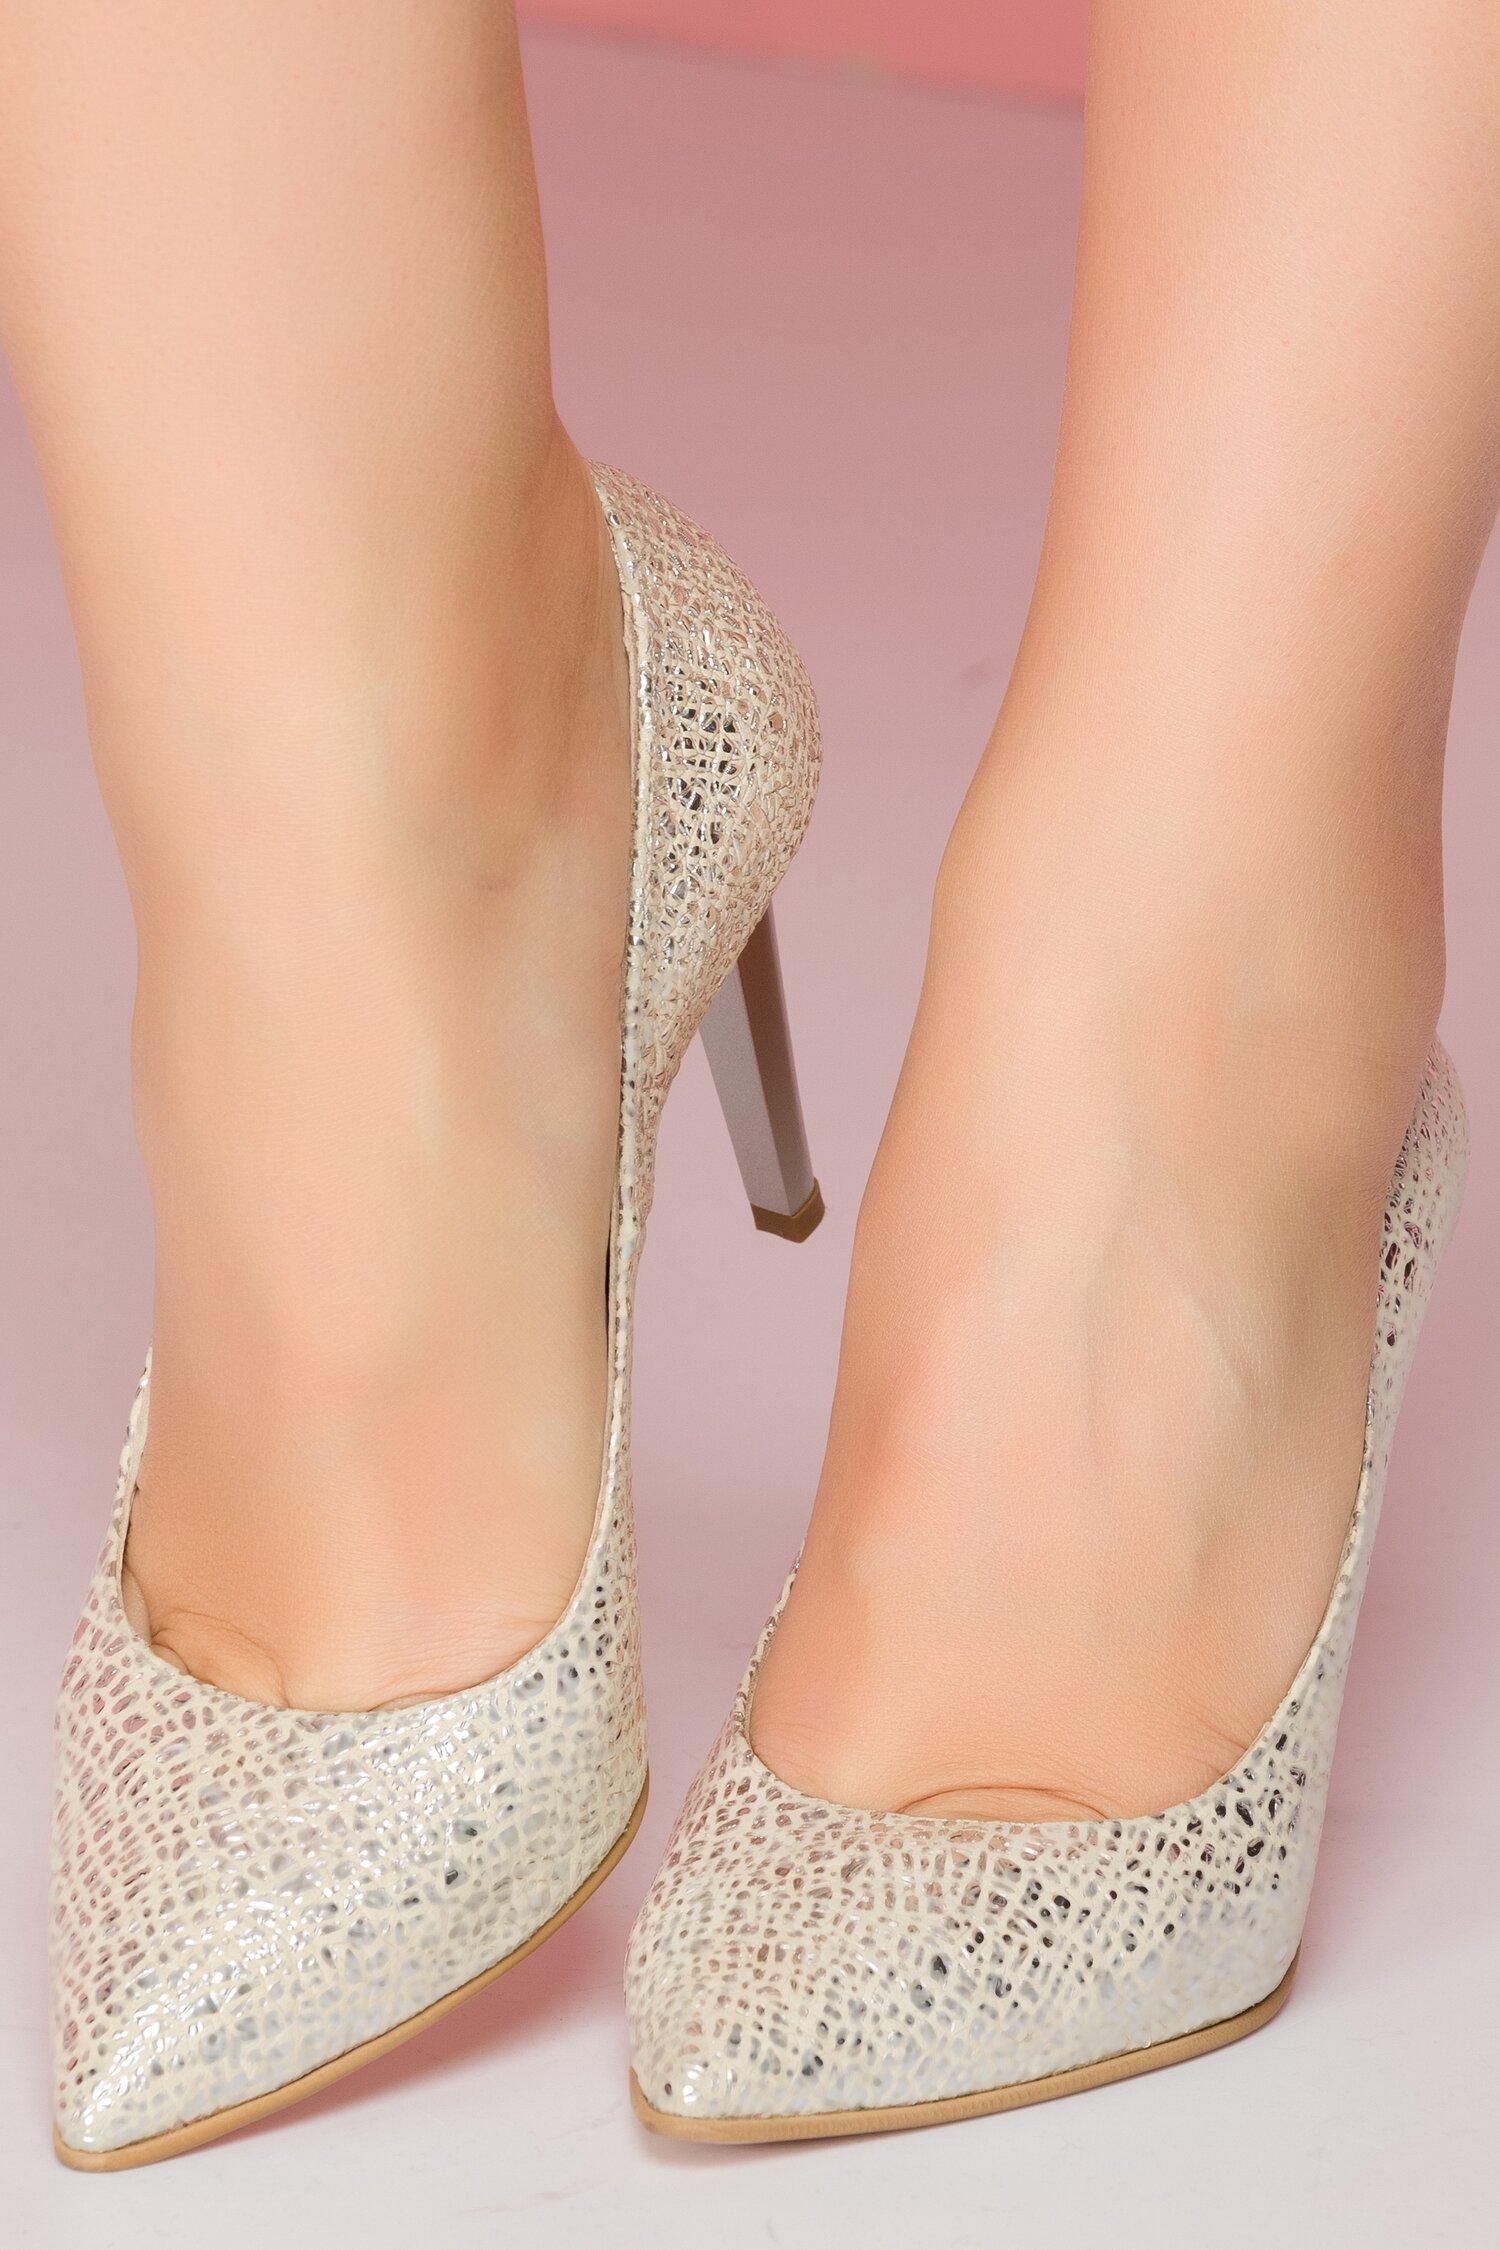 Pantofi Shanon stiletto bej cu aplicatii argintii stralucitoare